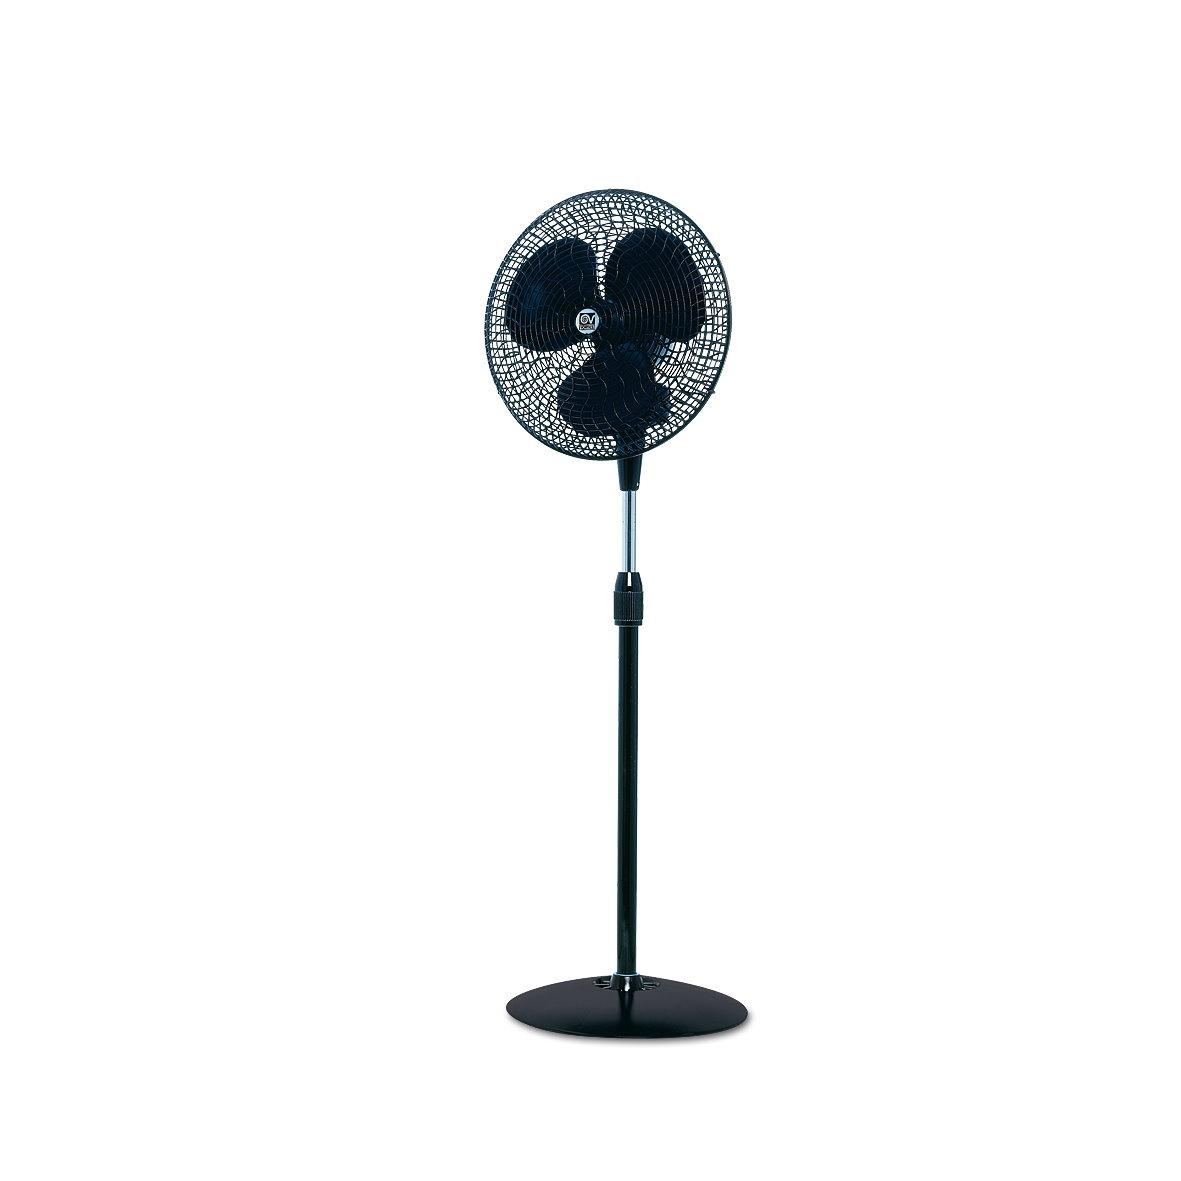 design ventilator standventilator stand l fter raumventilator windmaschine profi. Black Bedroom Furniture Sets. Home Design Ideas